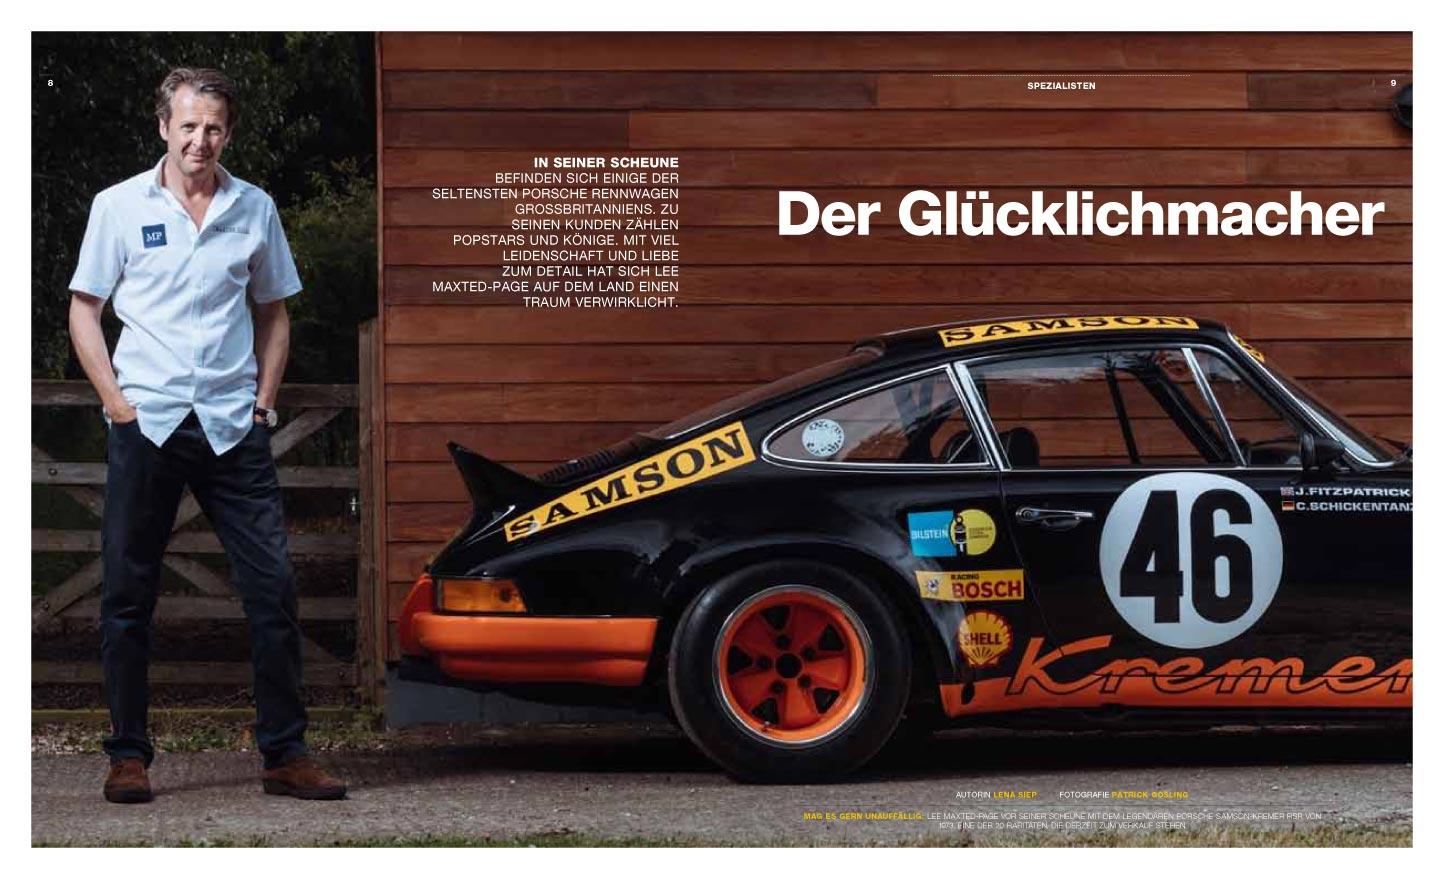 Porsche Classic visit Maxted-Page Porsche specialists